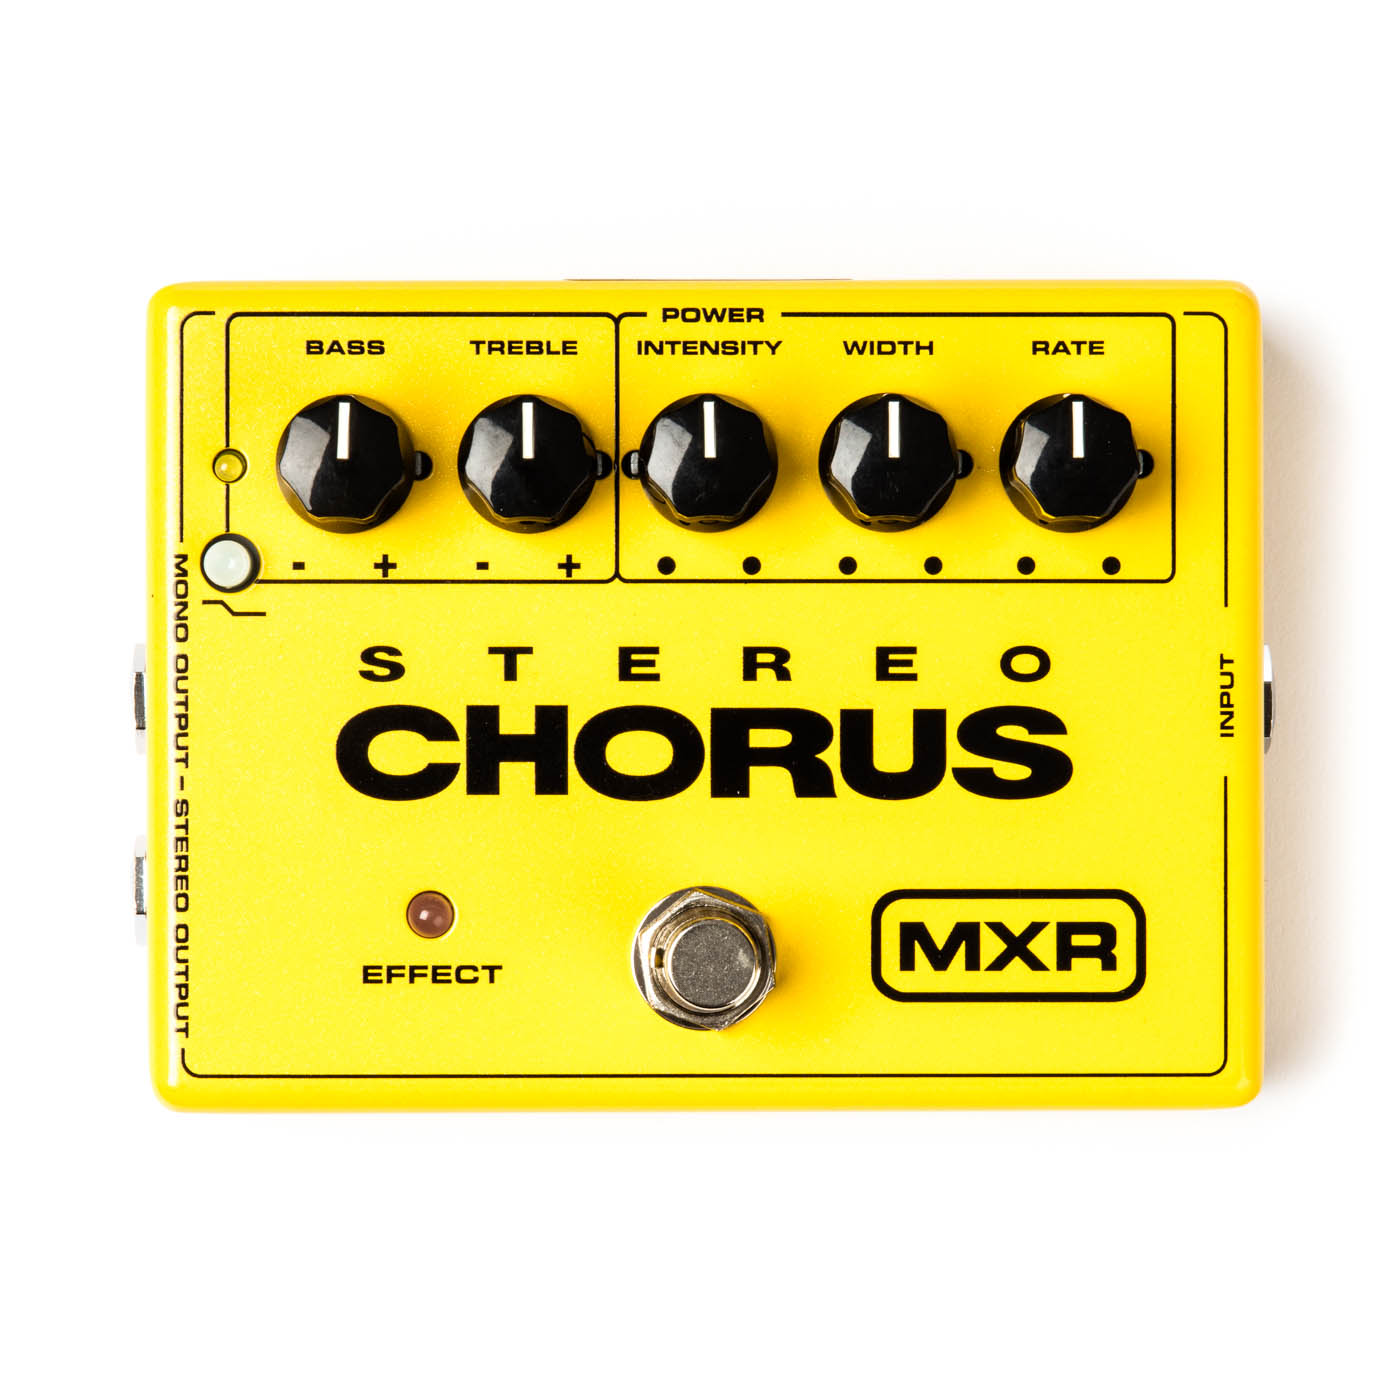 Dunlop MXR M134 Stereo Chorus Pedal